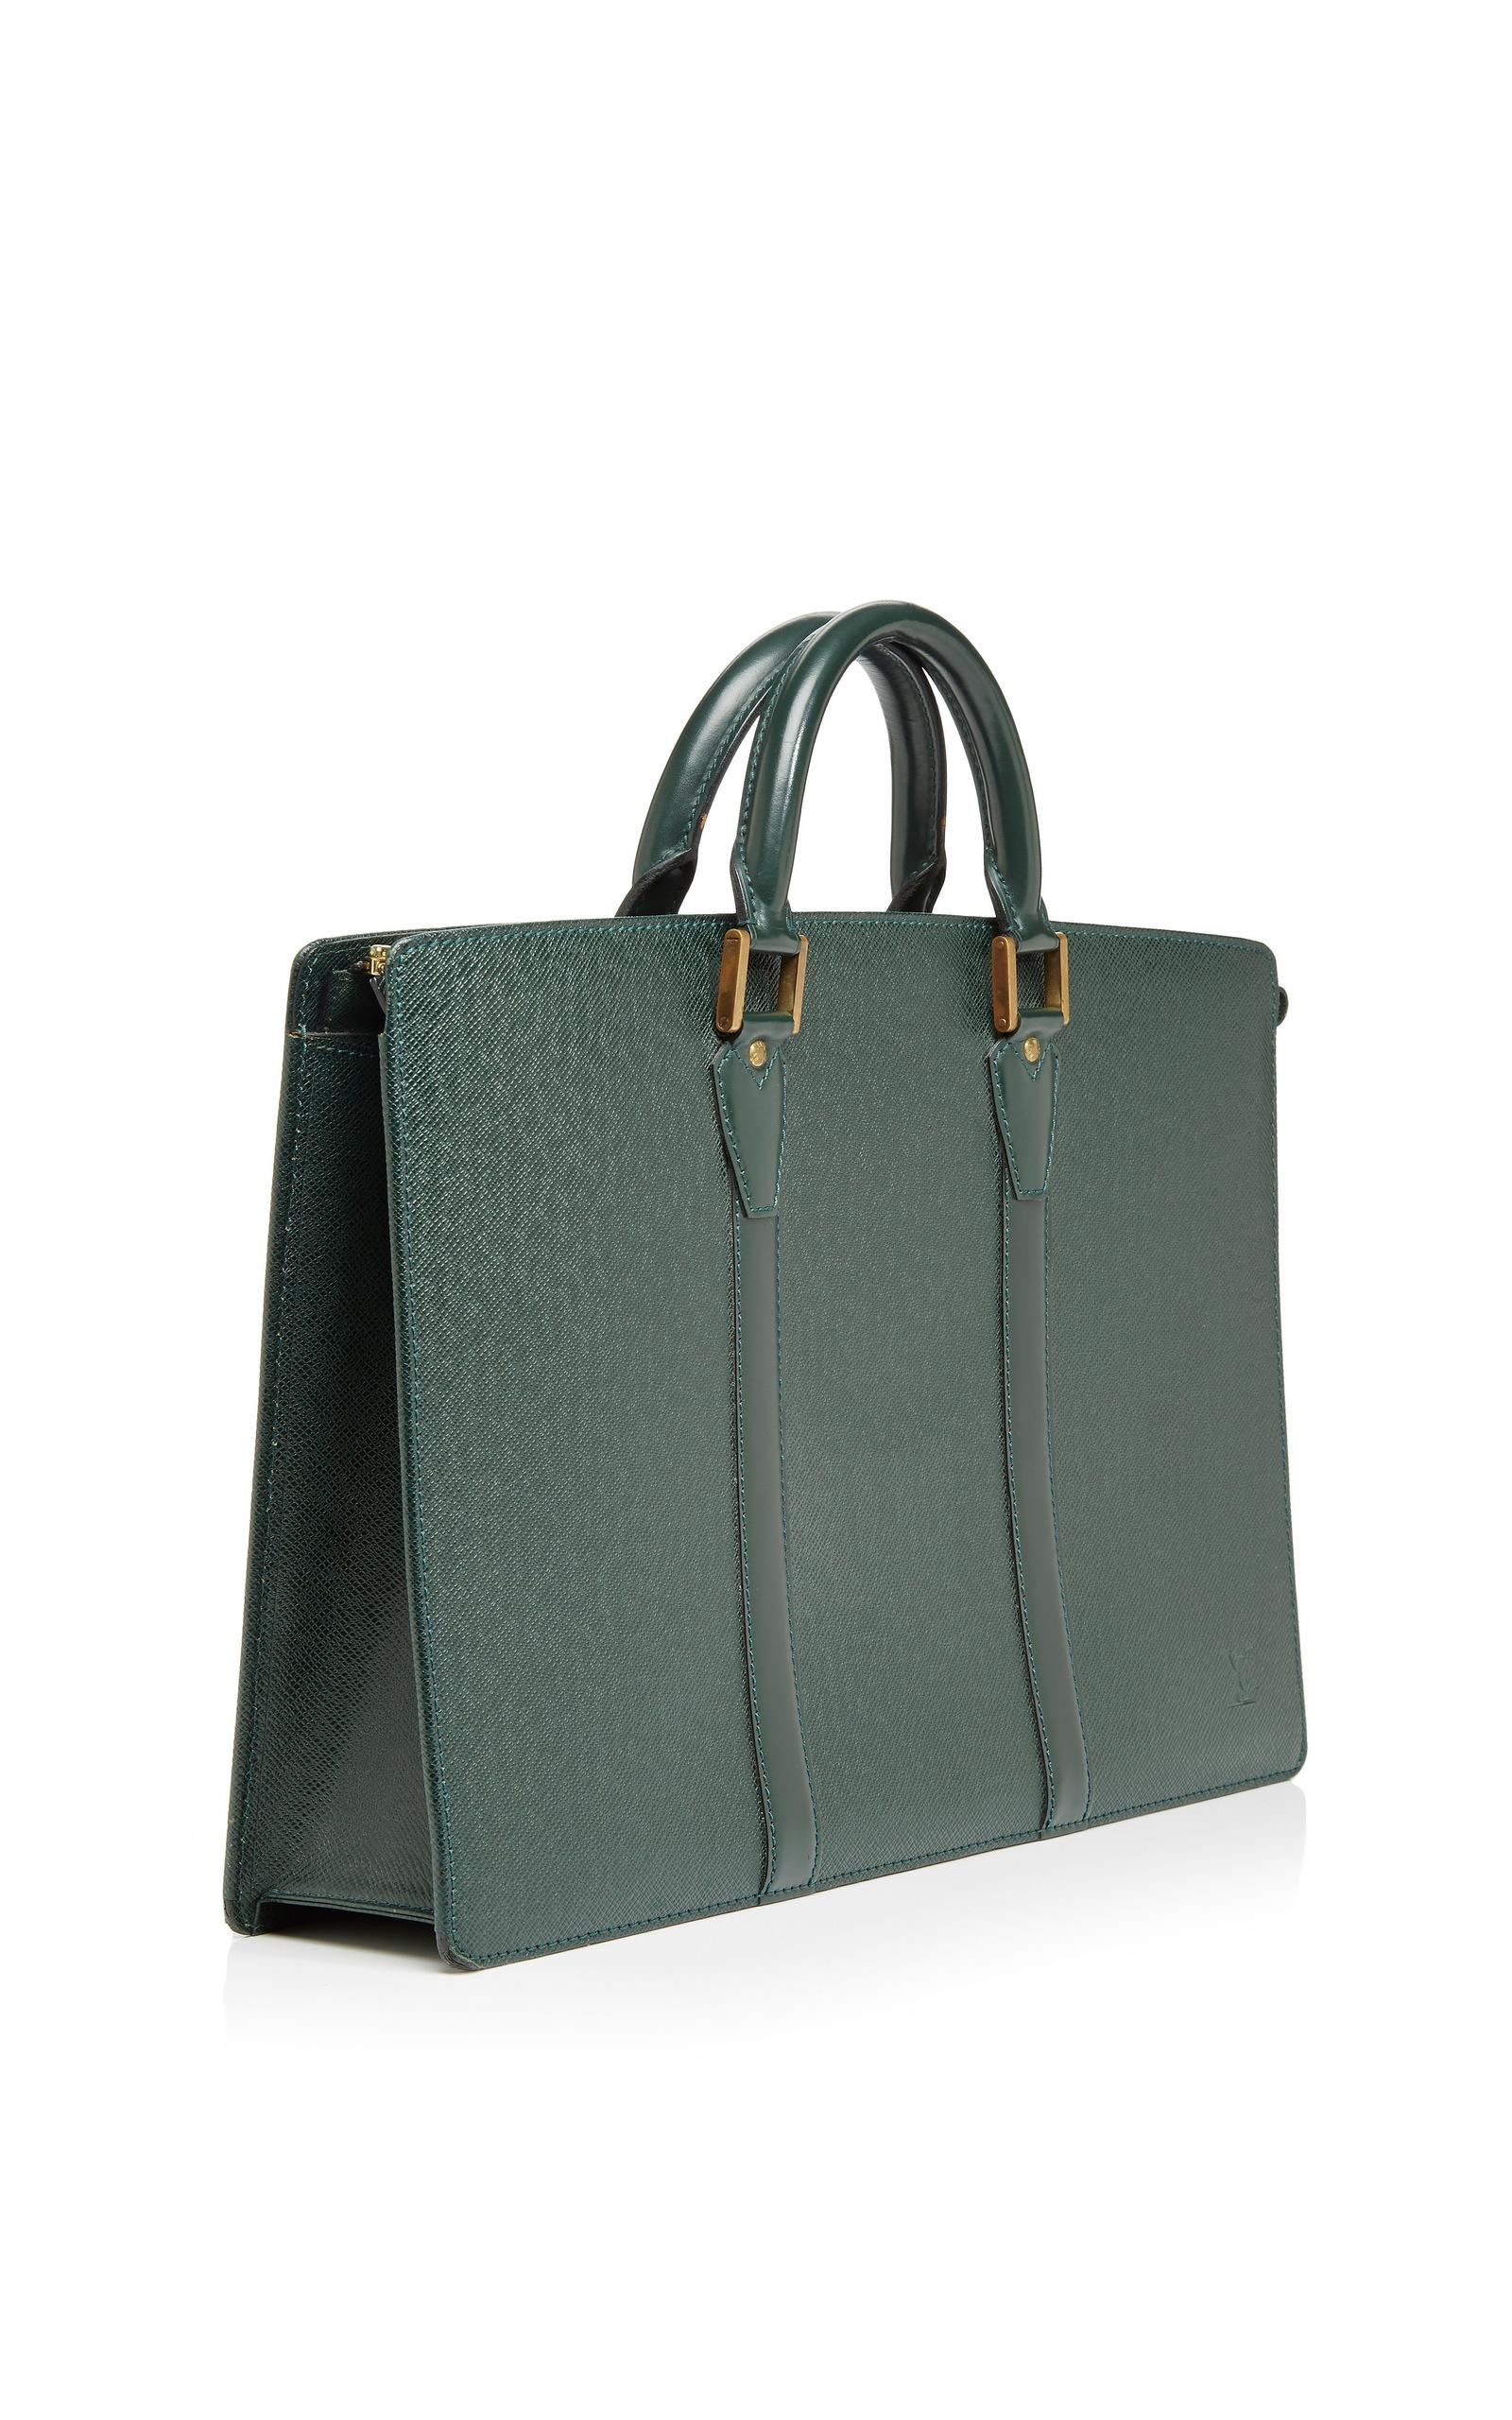 39733bd683e8 What Goes Around Comes AroundVintage Louis Vuitton Green Taiga Lozan  Briefcase